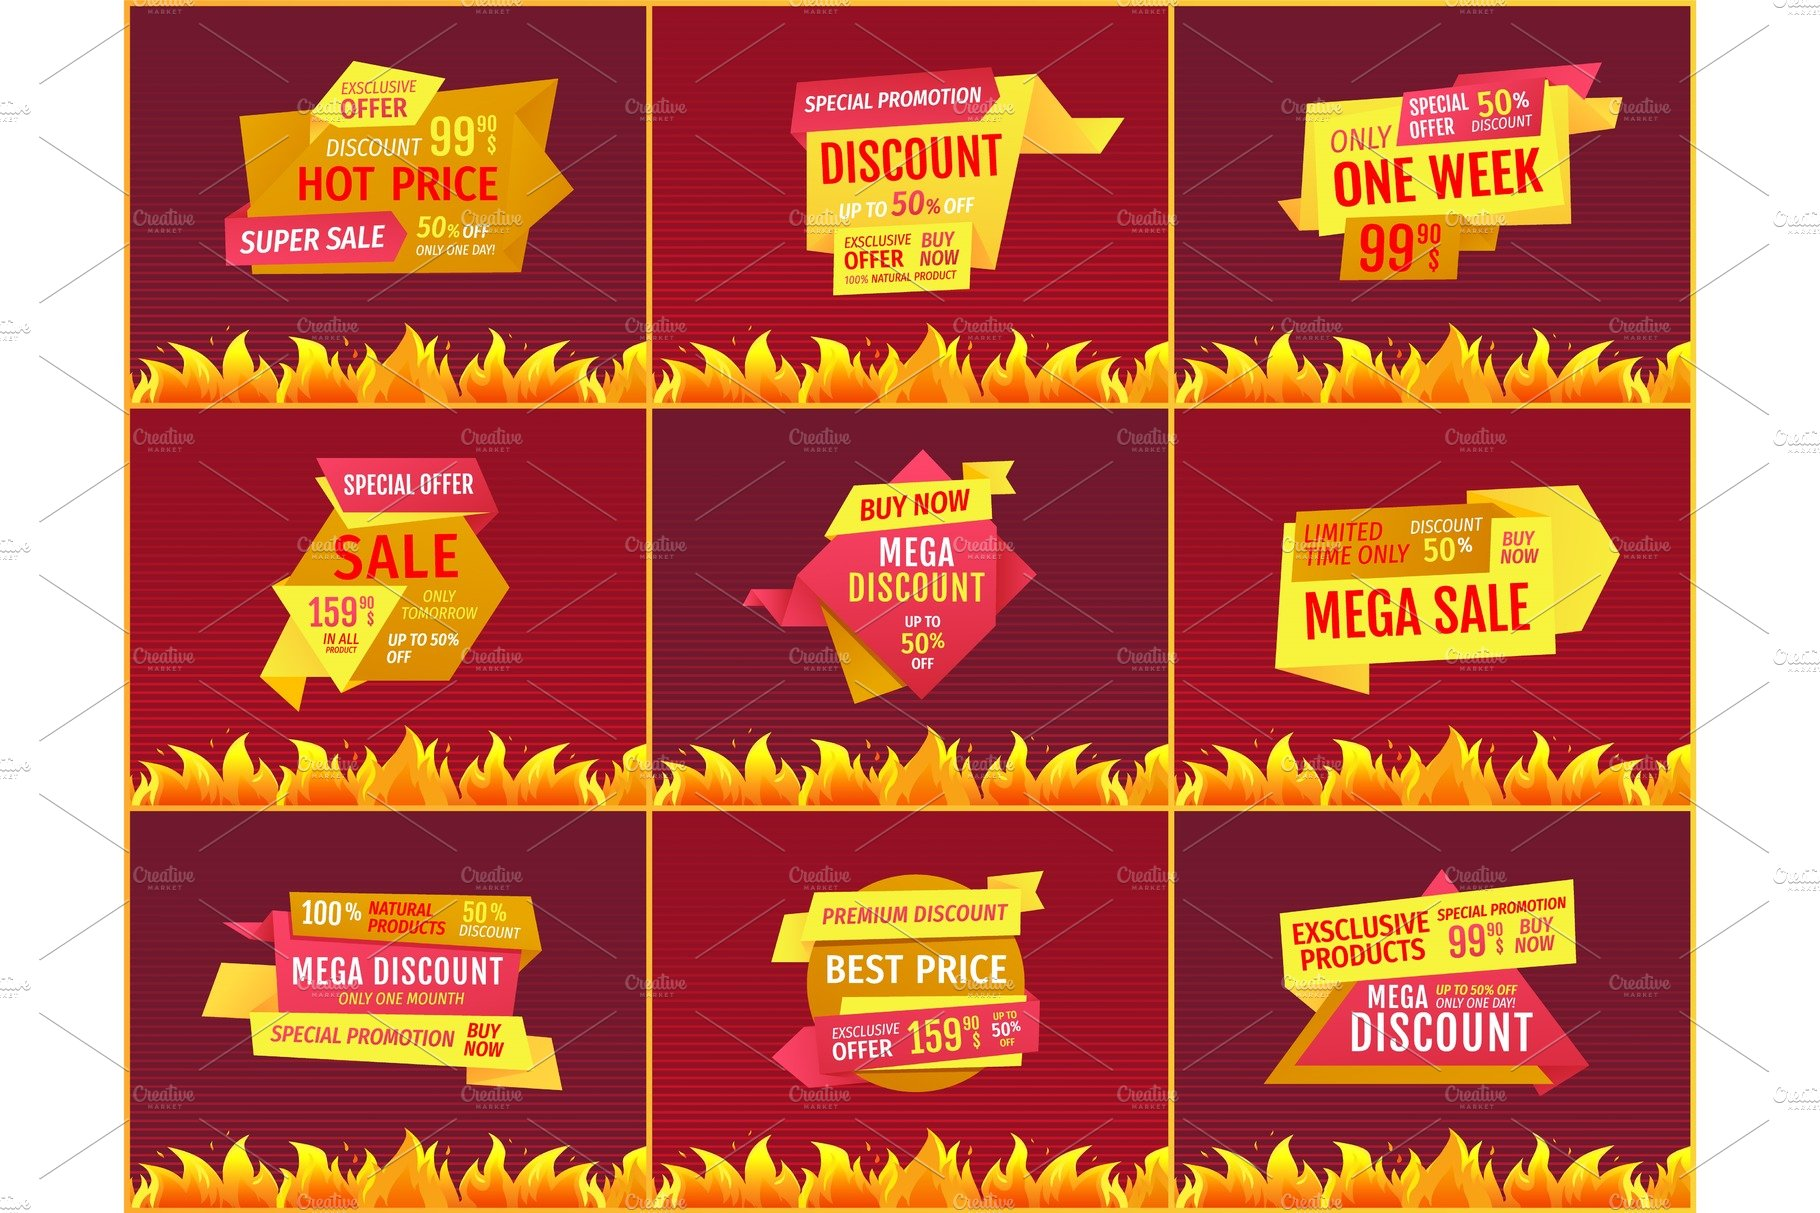 d5b22e2303640 Mega Sale Offers on Geometric Shape ~ Illustrations ~ Creative Market